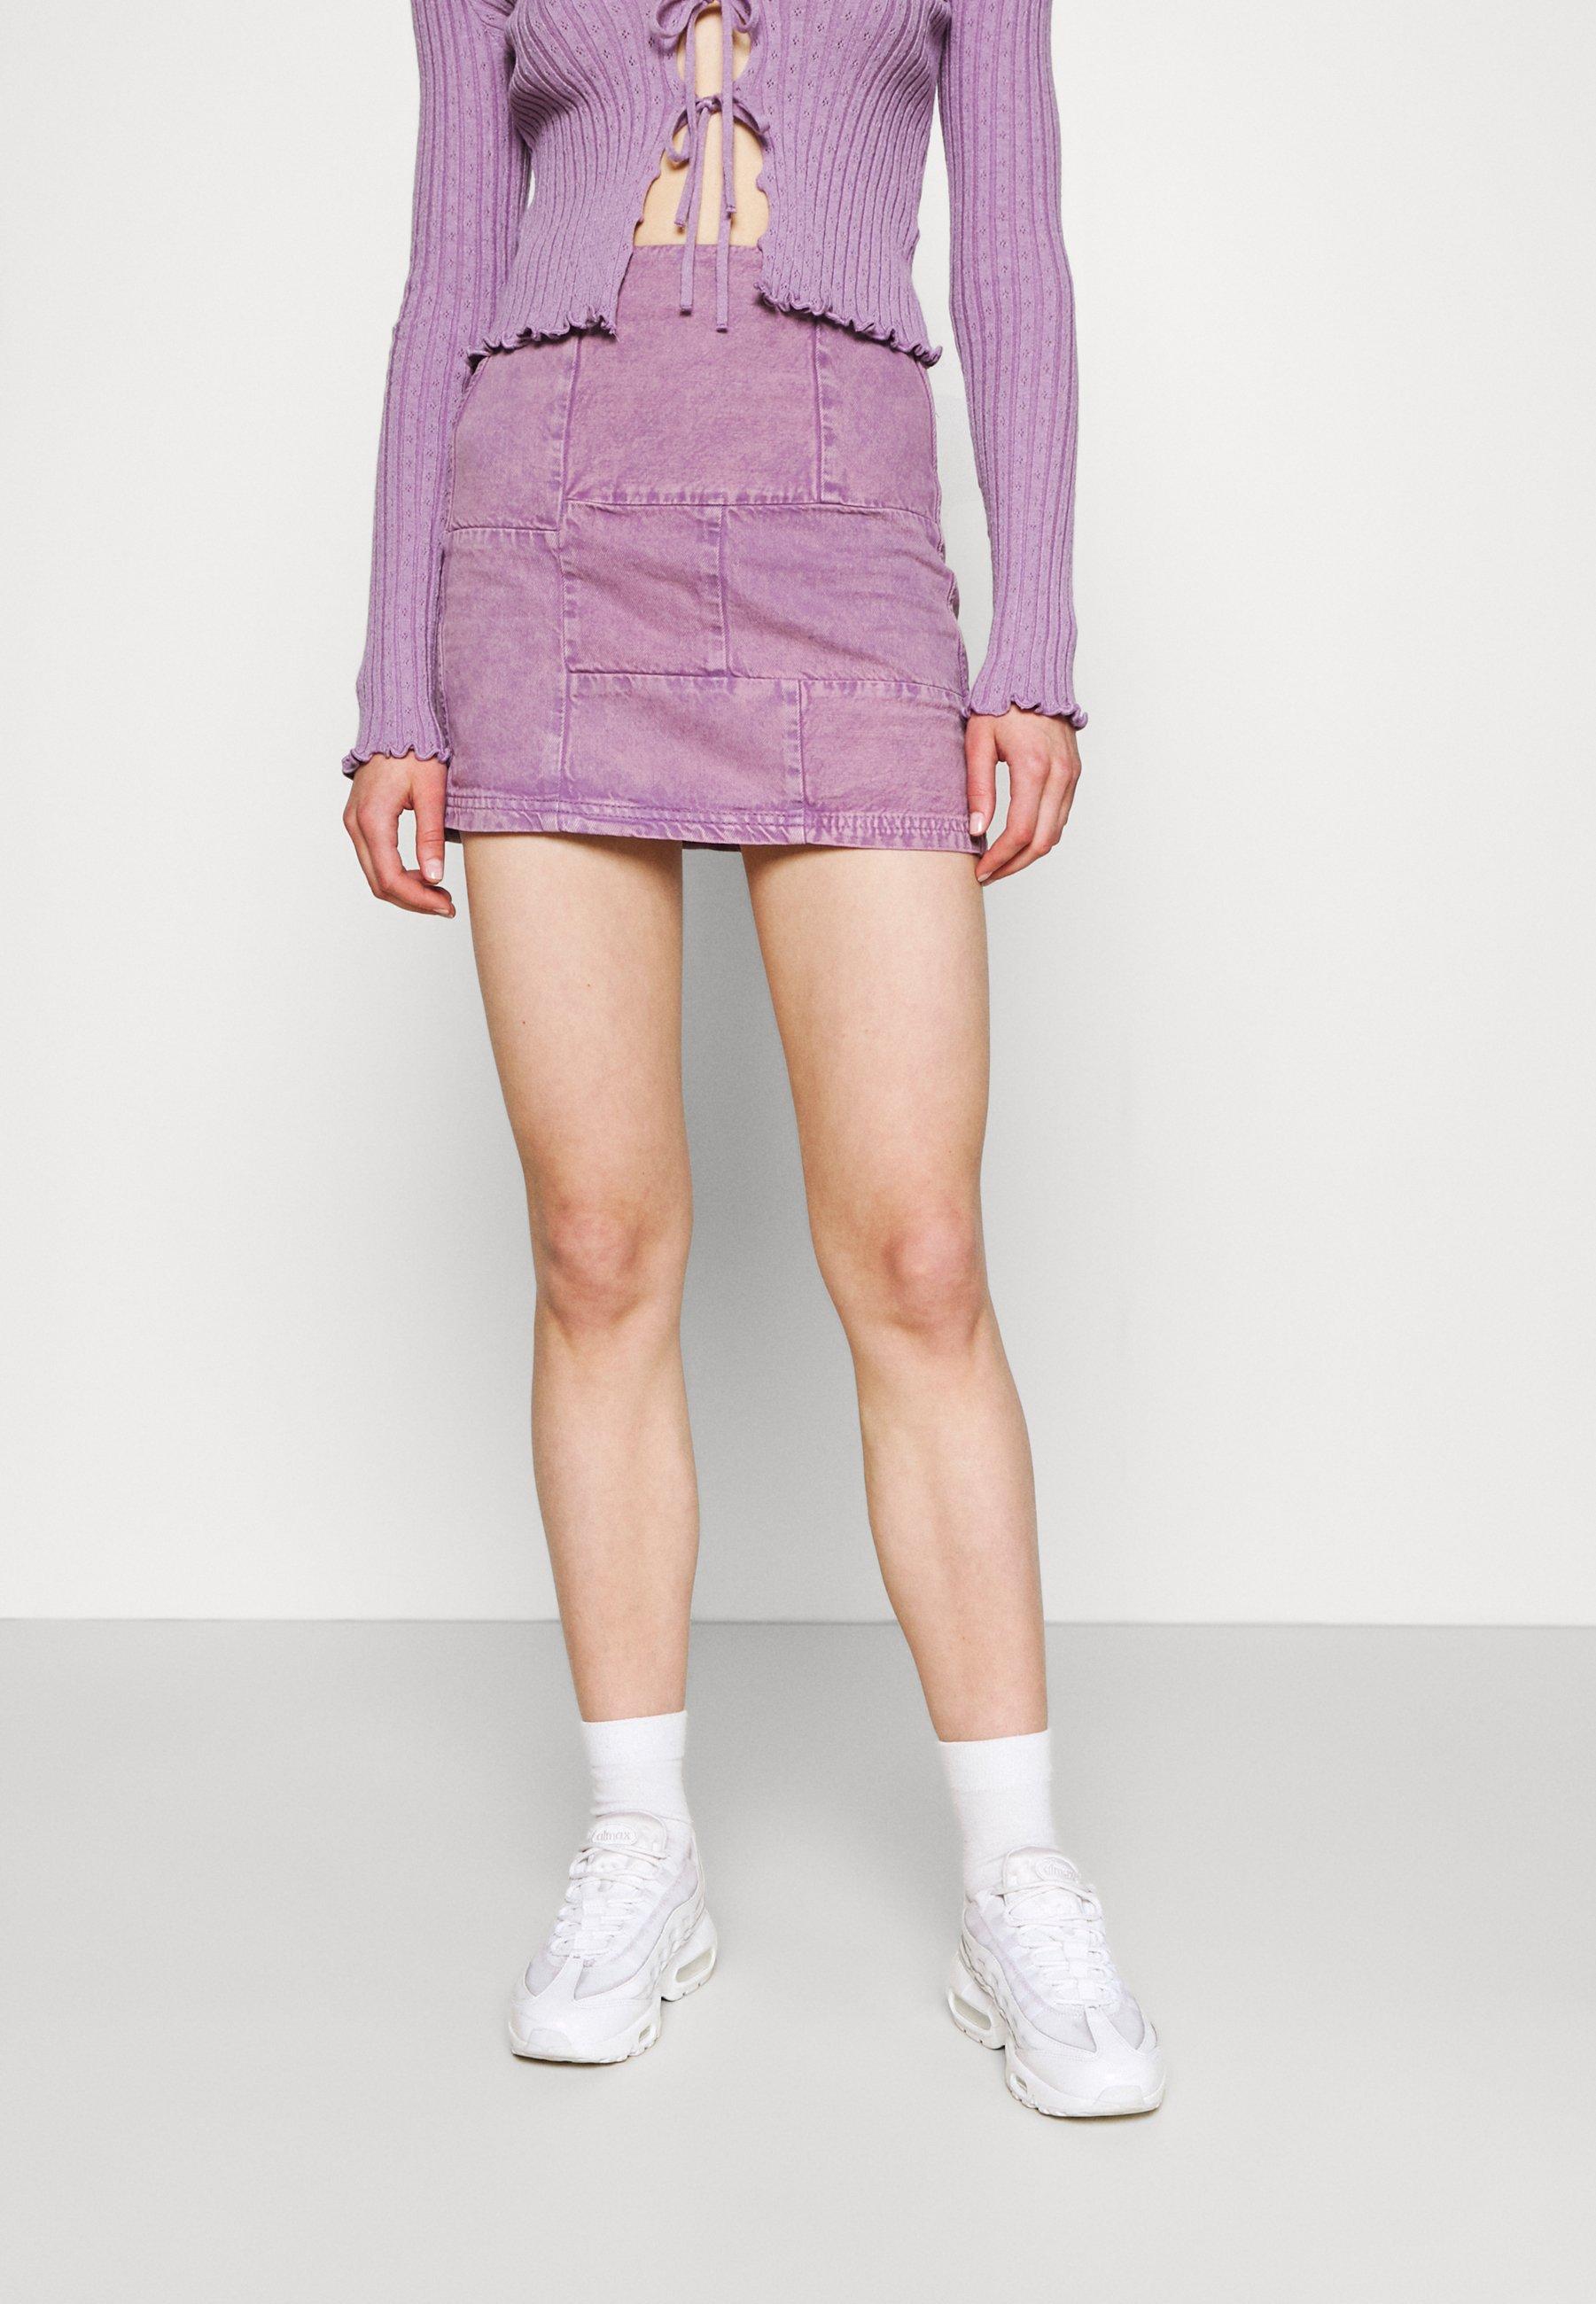 Femme PATCHWORK PELMET SKIRT - Minijupe